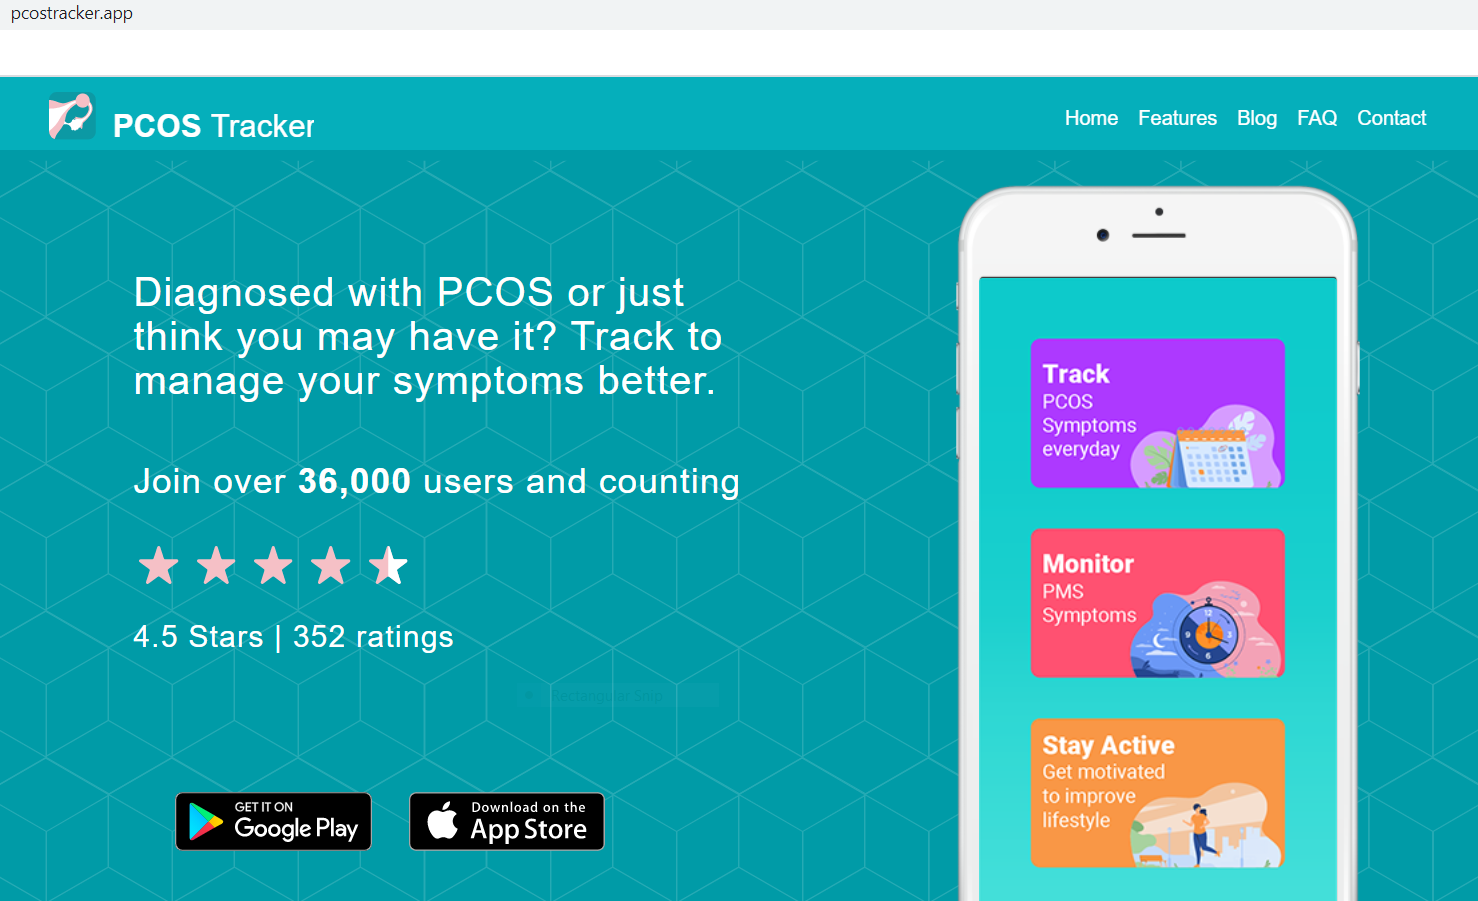 pcostracker.app website